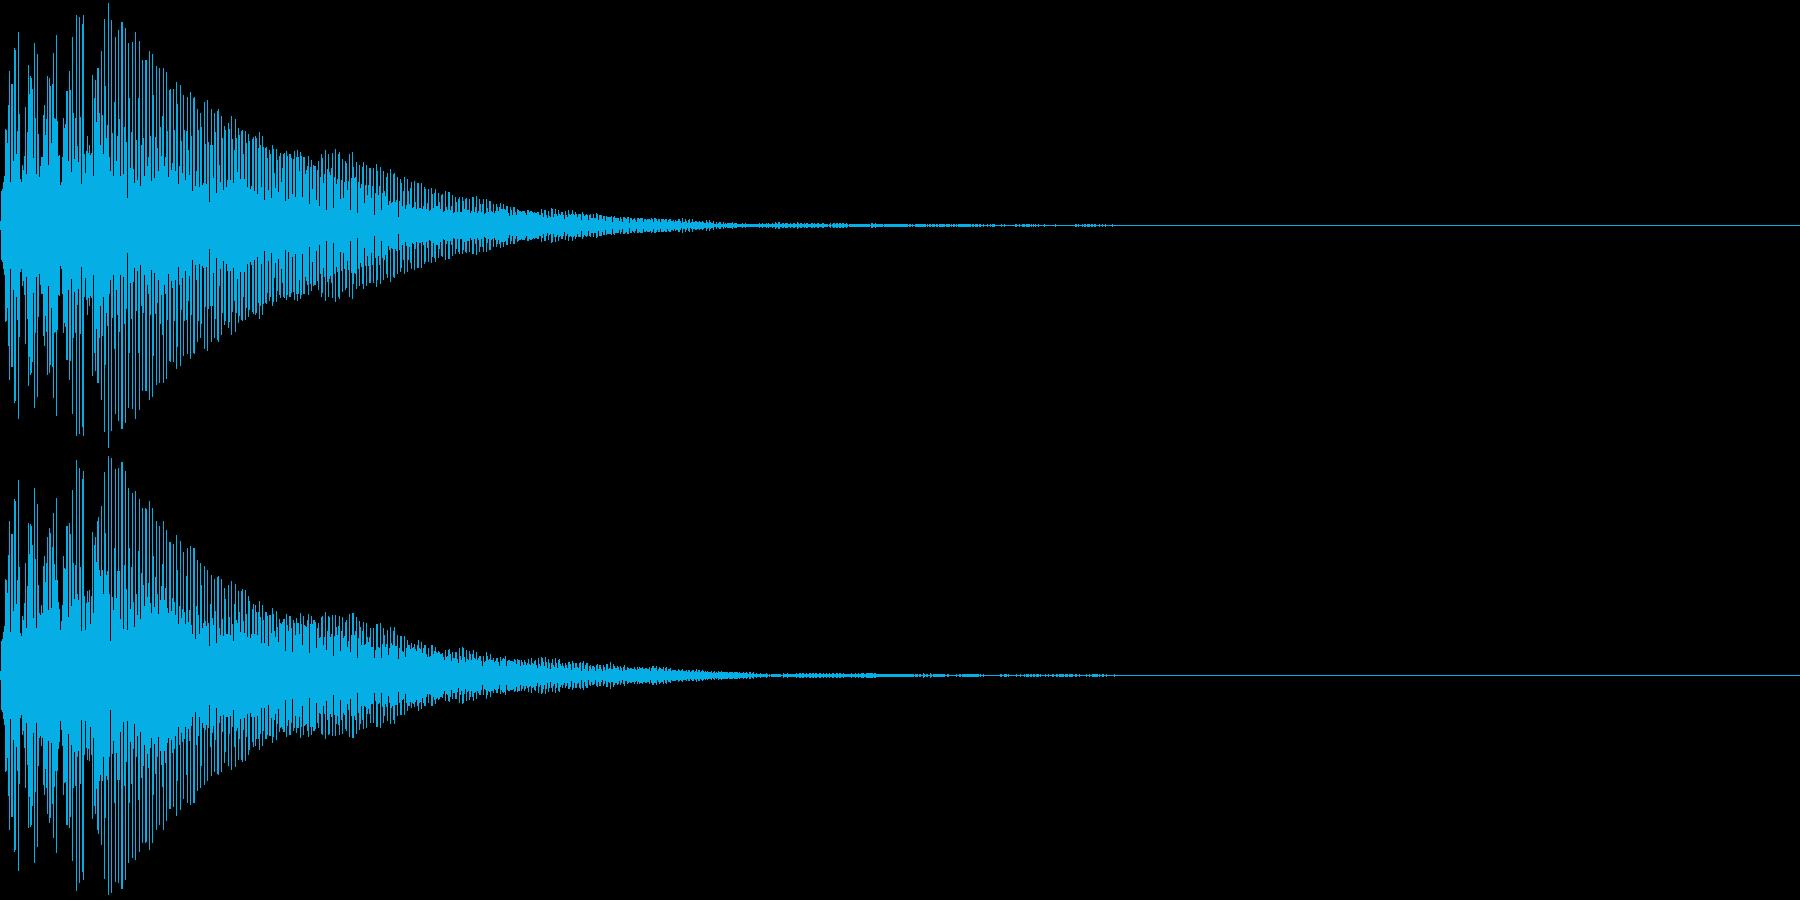 Battle 防御音 バリア アクションの再生済みの波形